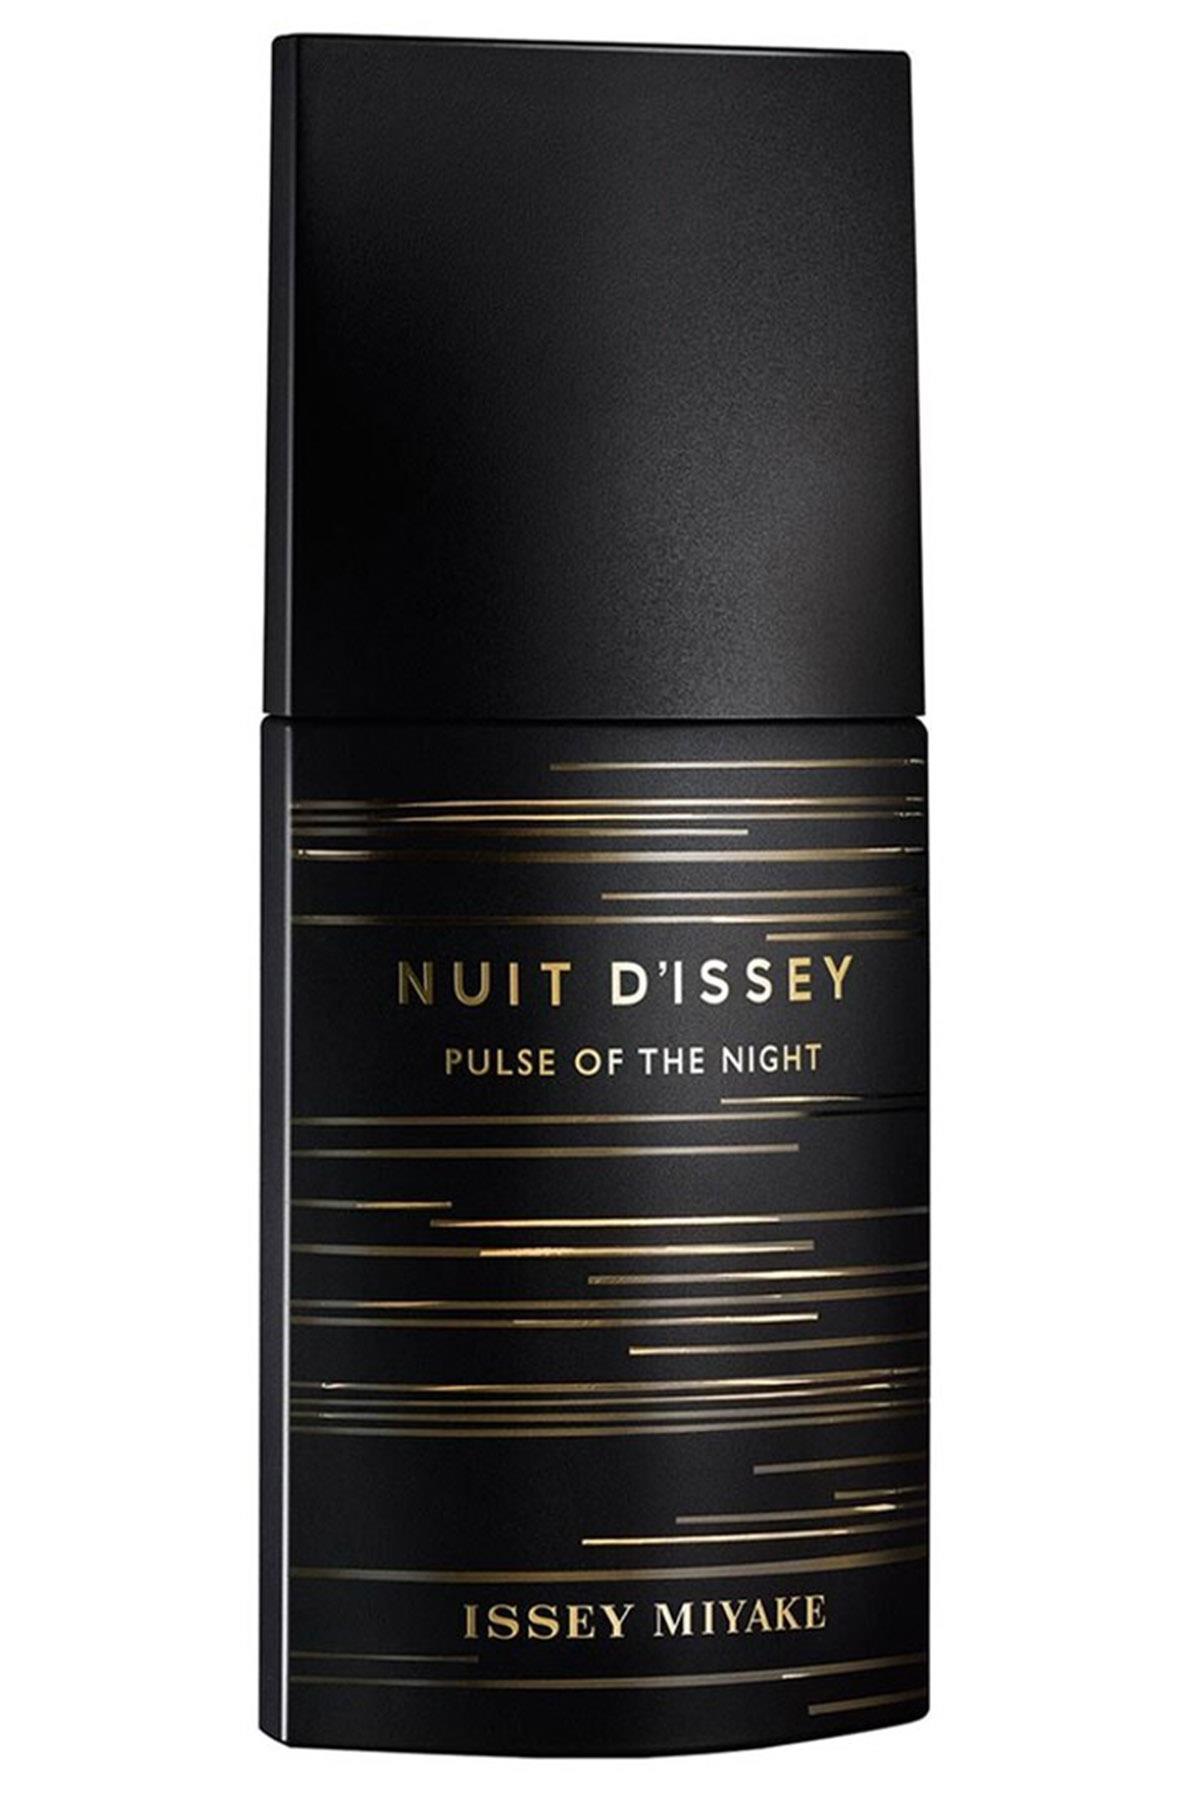 Issey Miyake Nuit D'Issey Pulse Of The Night EDP 100 ml Erkek Parfüm